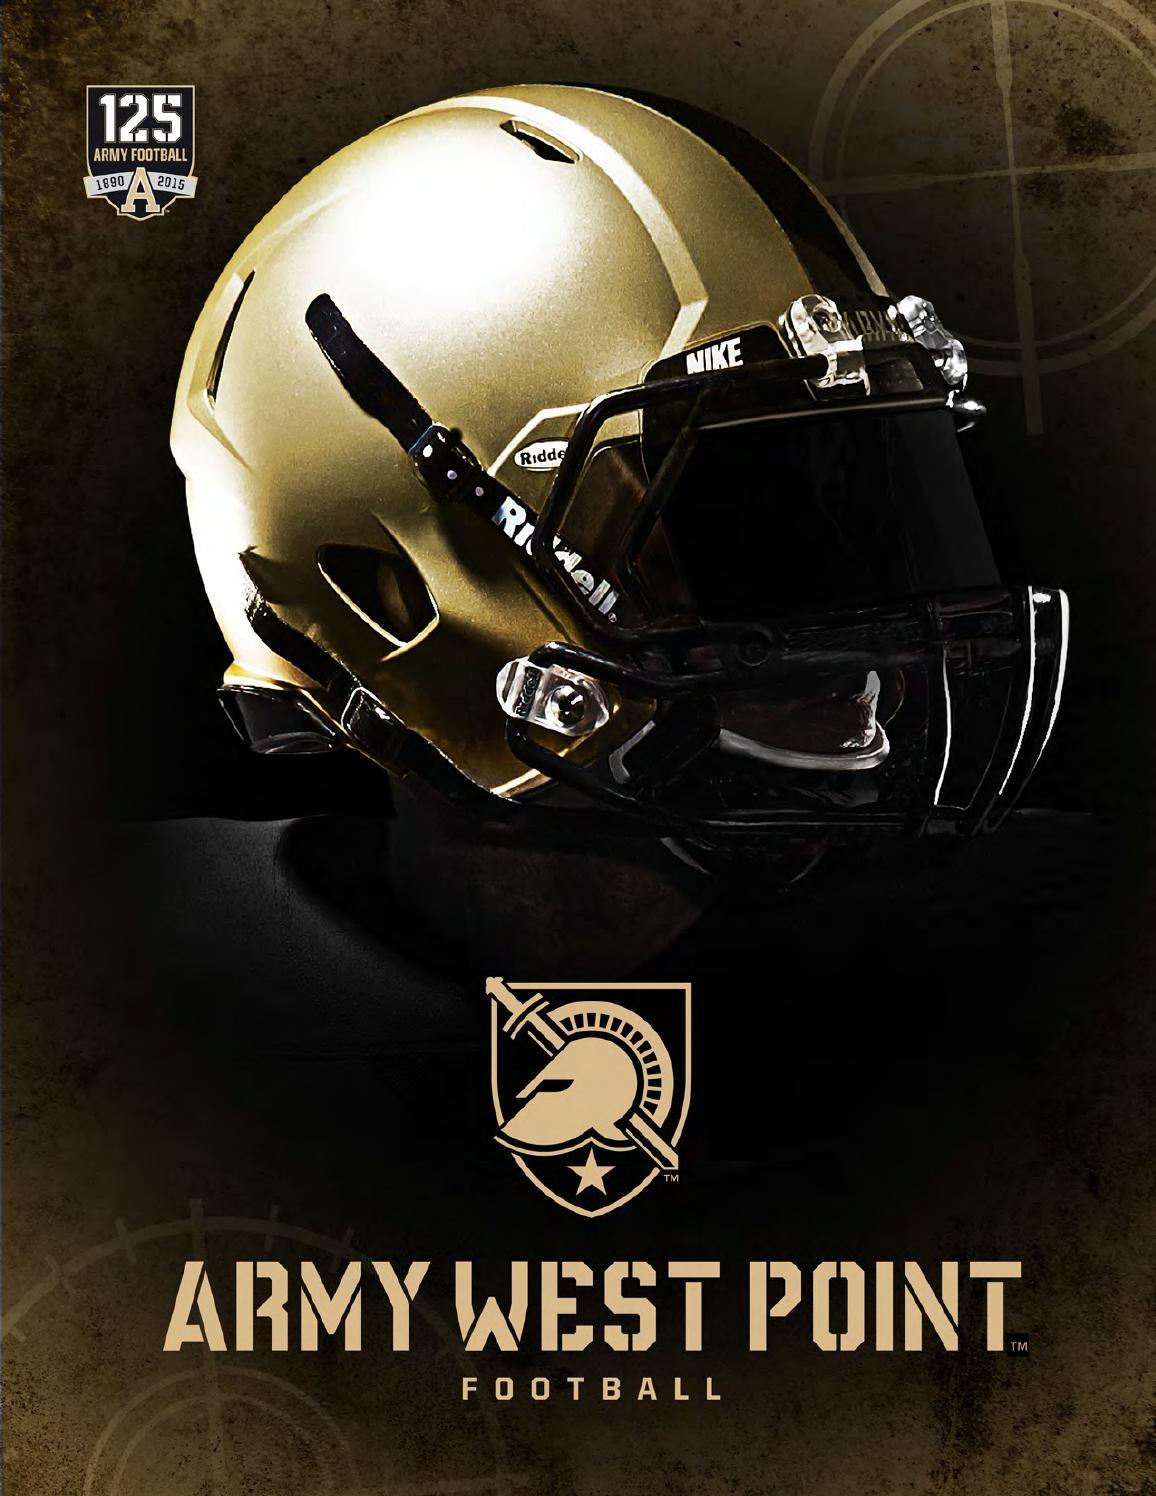 2015 Football Media Guide by Army West Point Athletics - issuu b19ea3a91